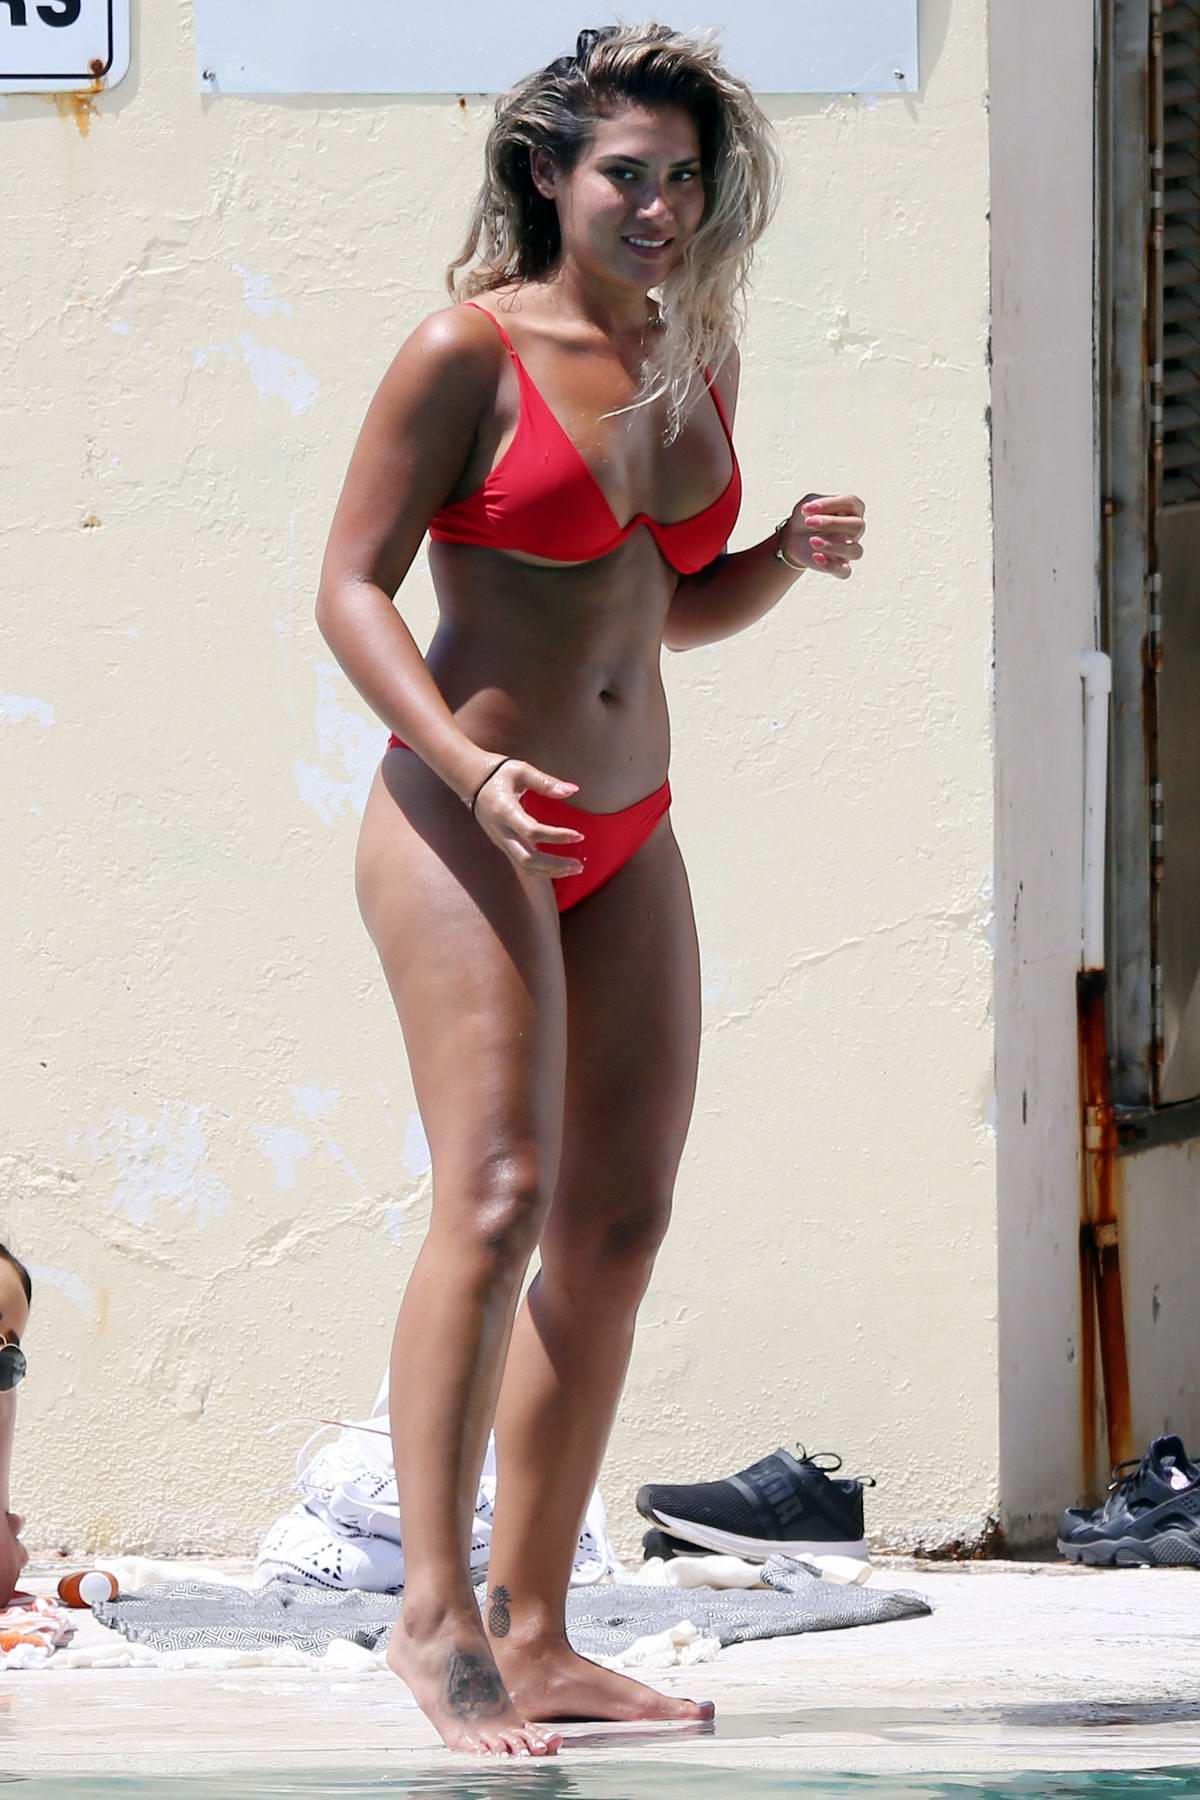 Noni Janur wears a red bikini while she enjoy the pool in Sydney, Australia